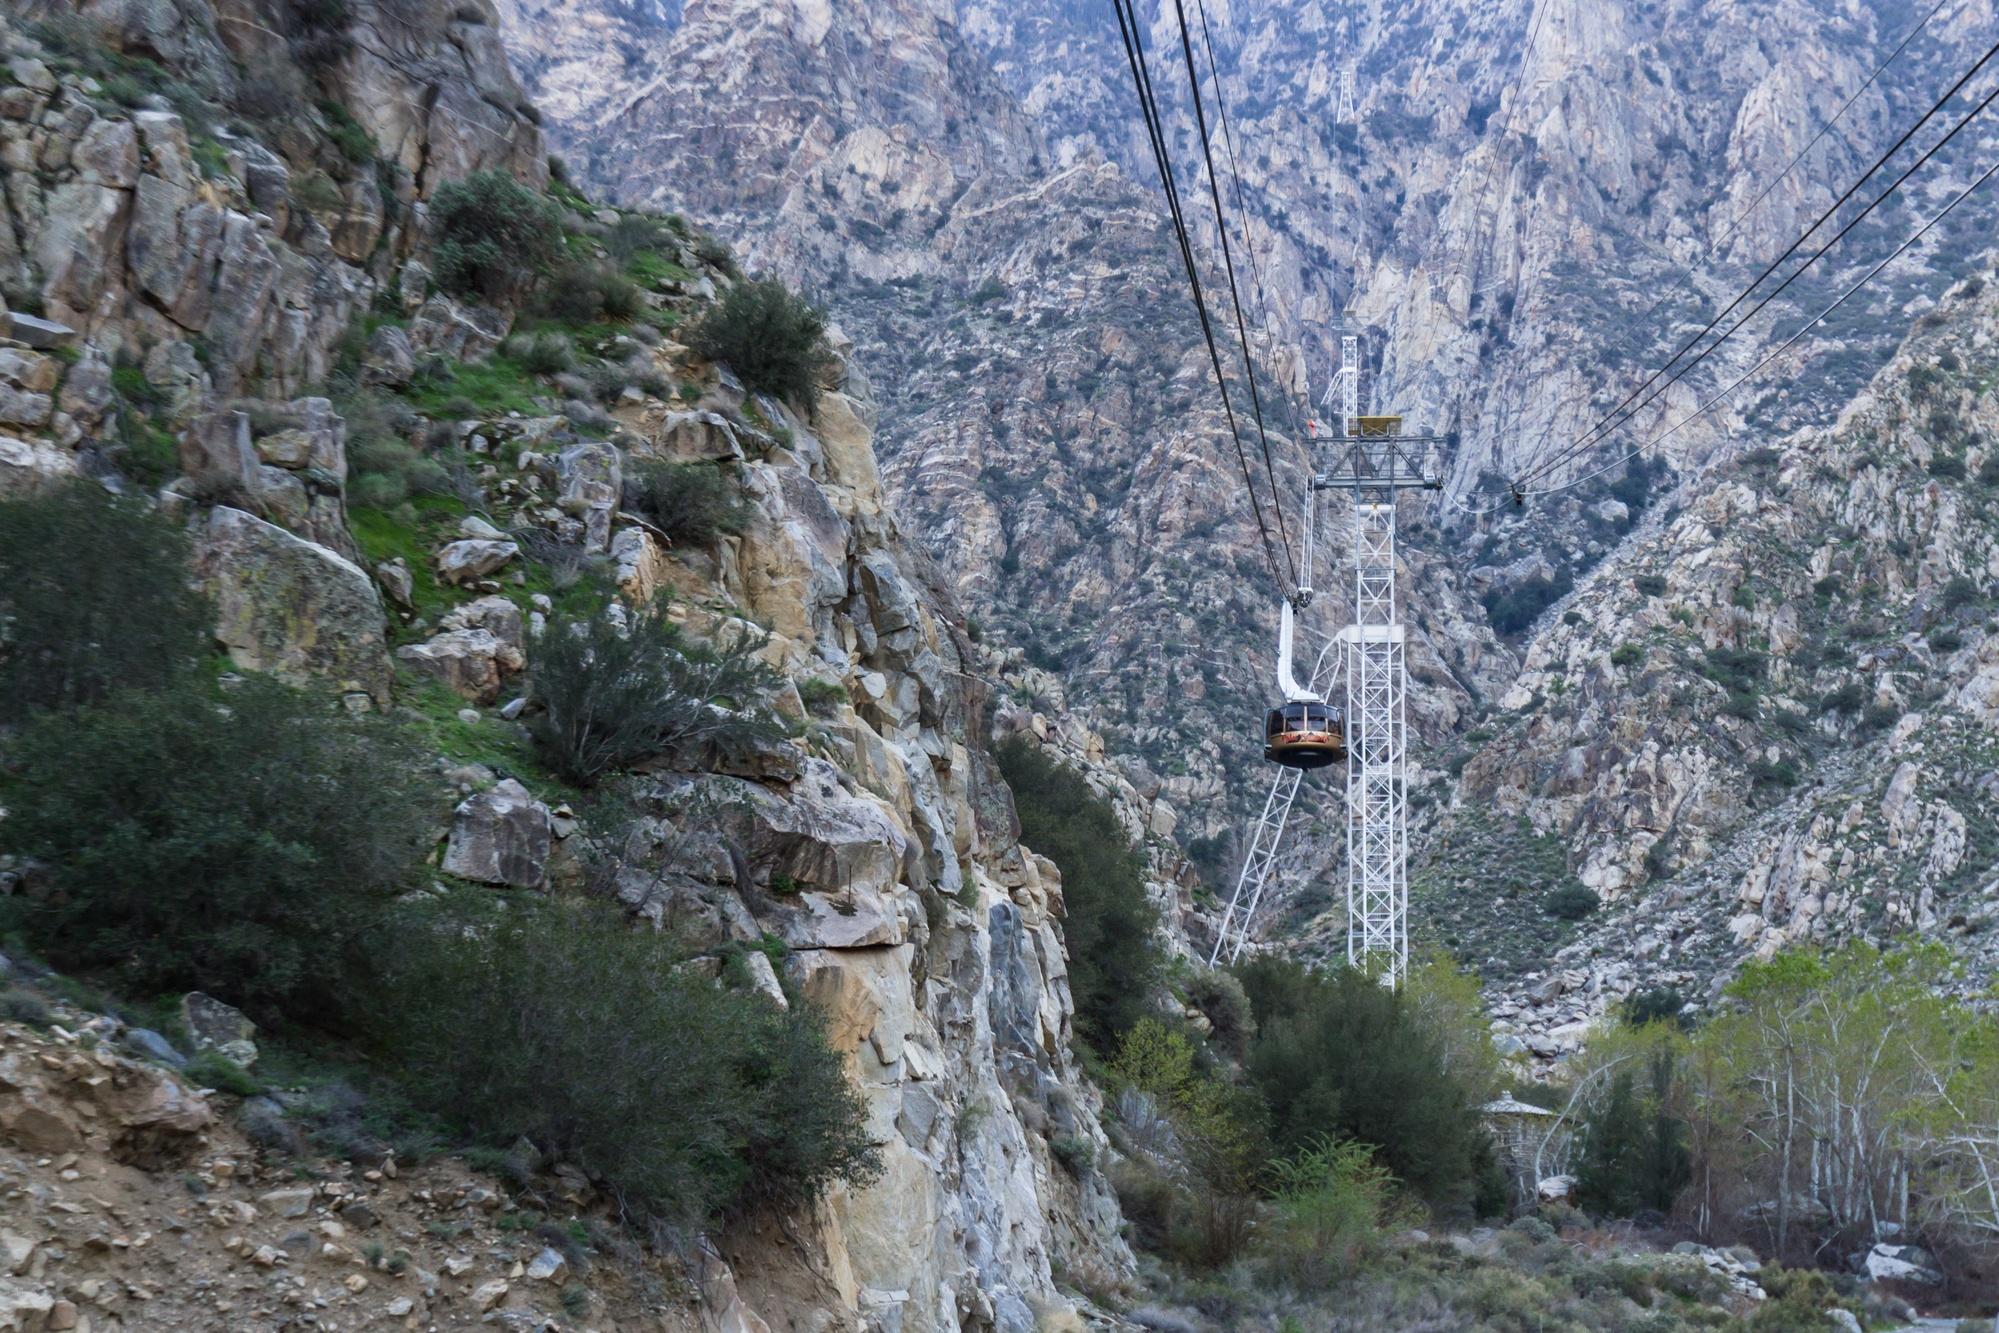 Palm Springs Aerial Tram in the San Jacinto Mountain Range